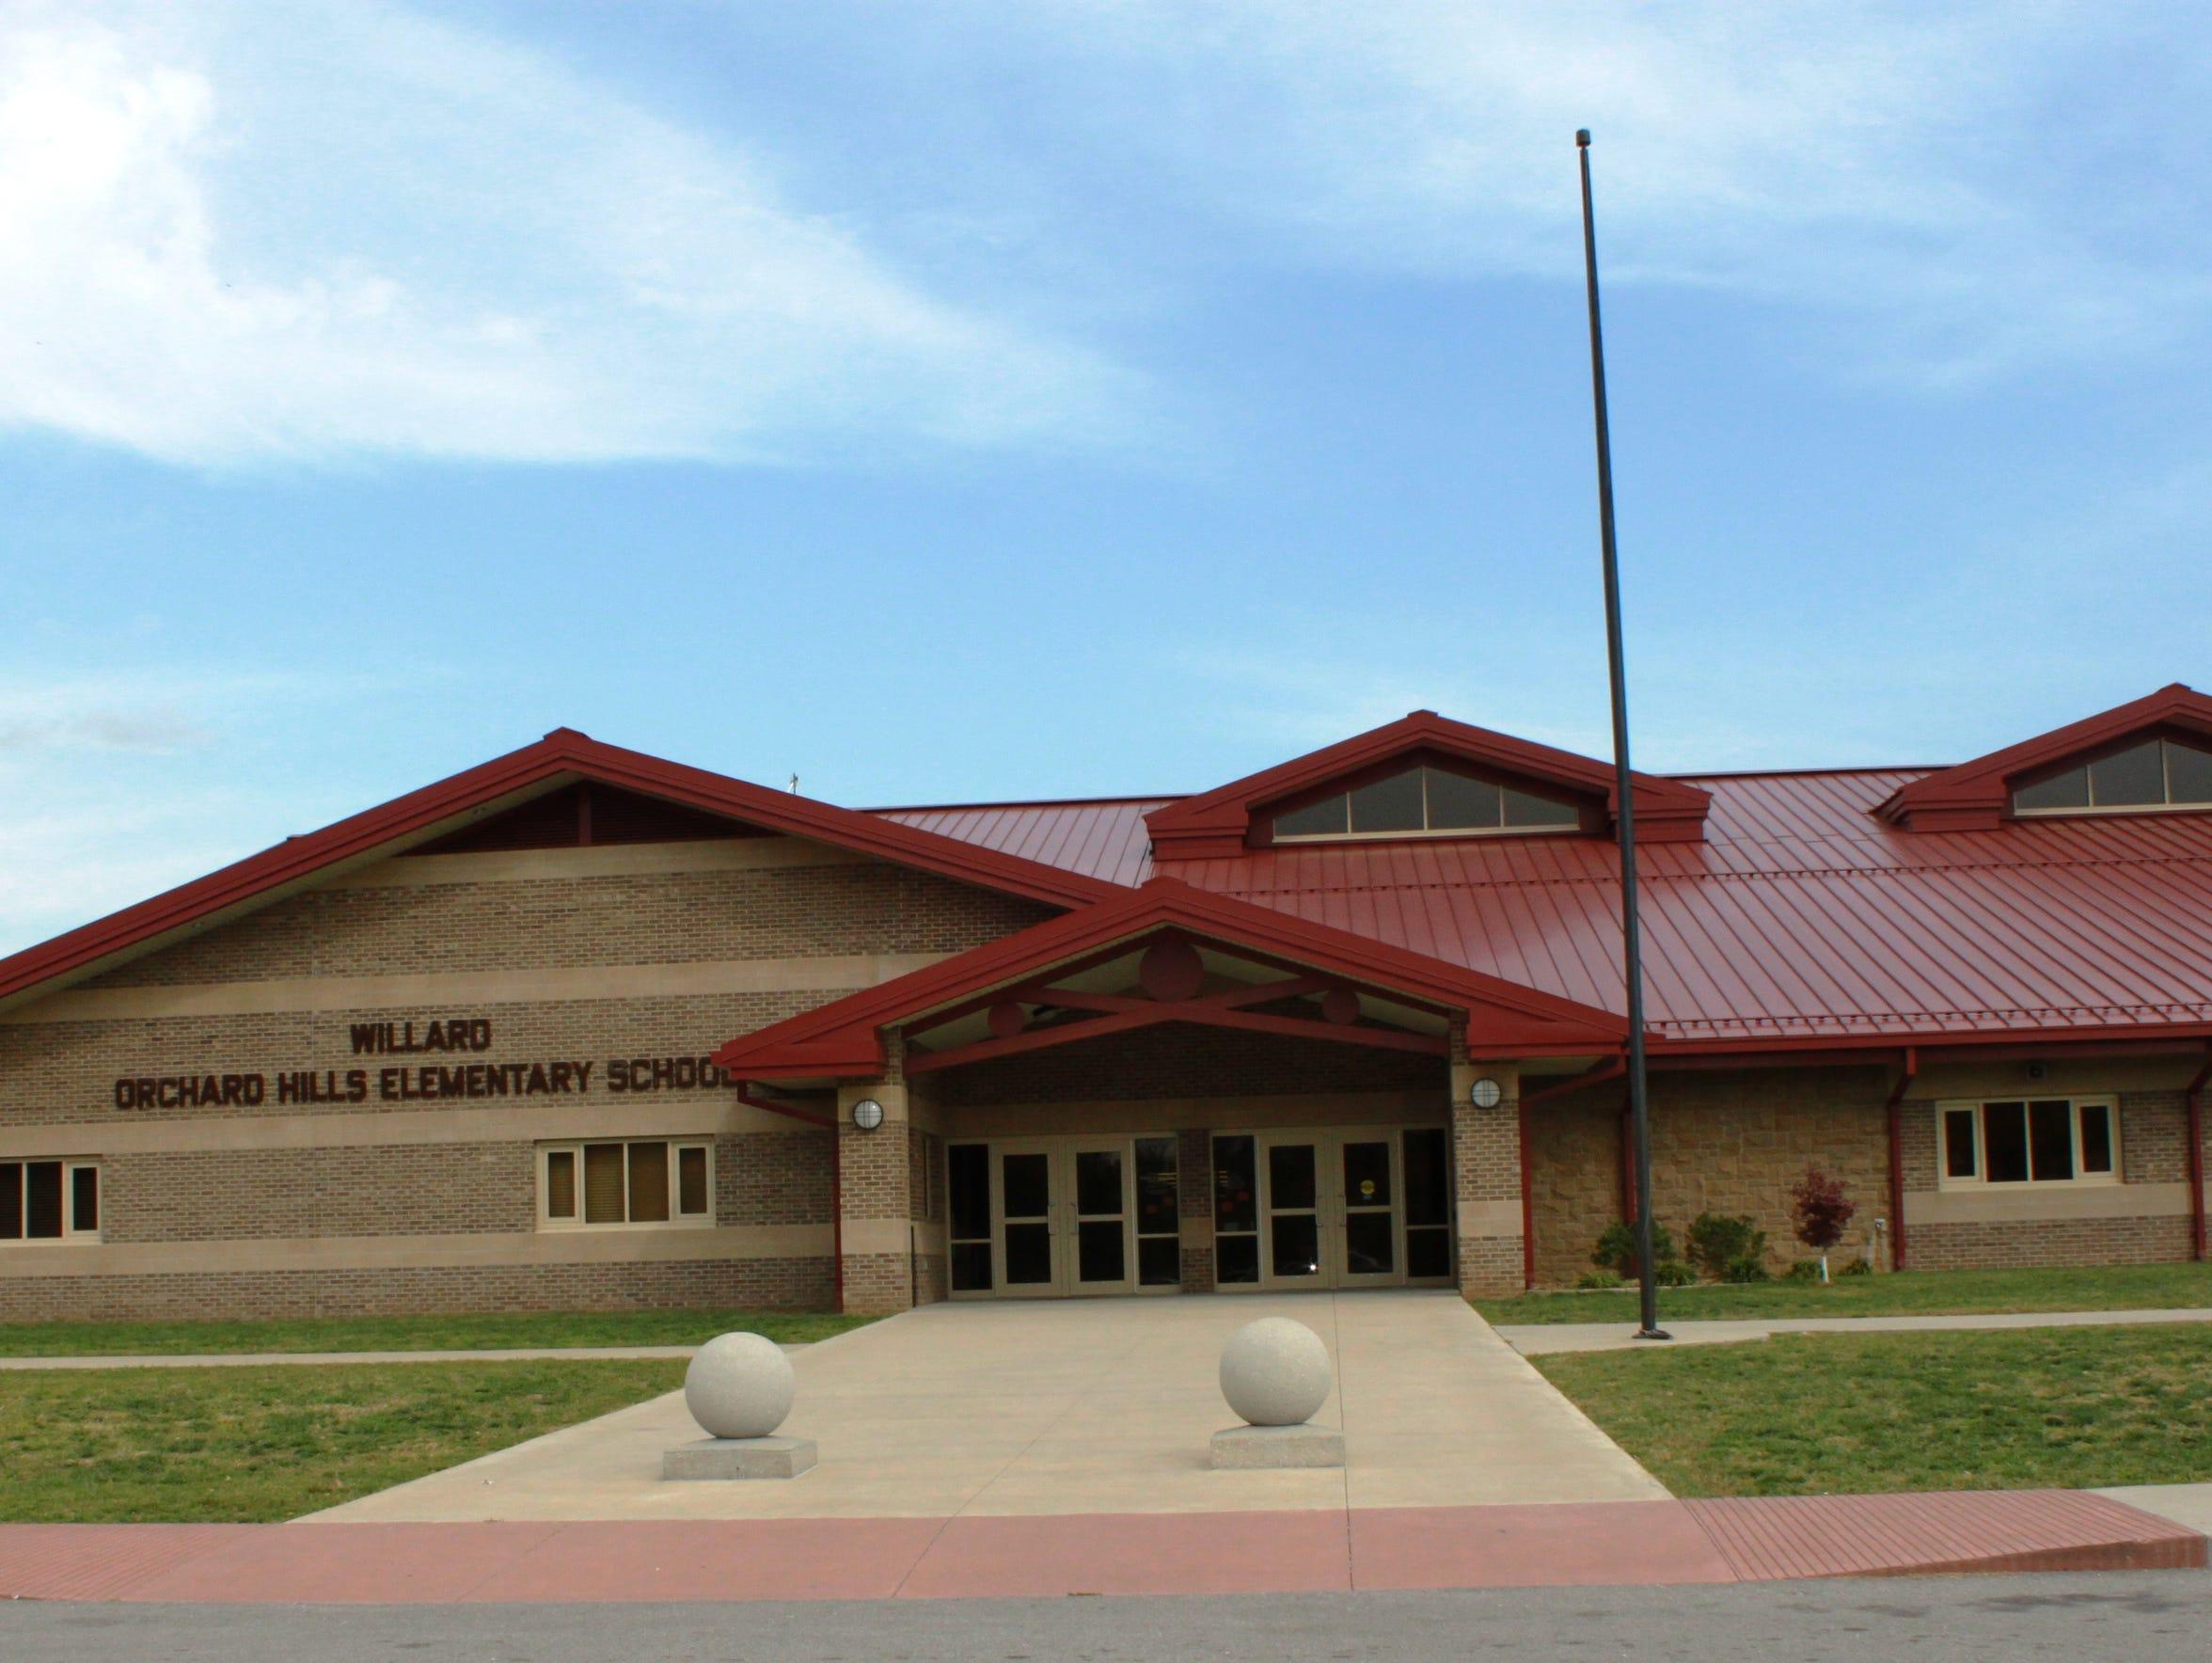 The Willard school board has proposed a $5.5 million